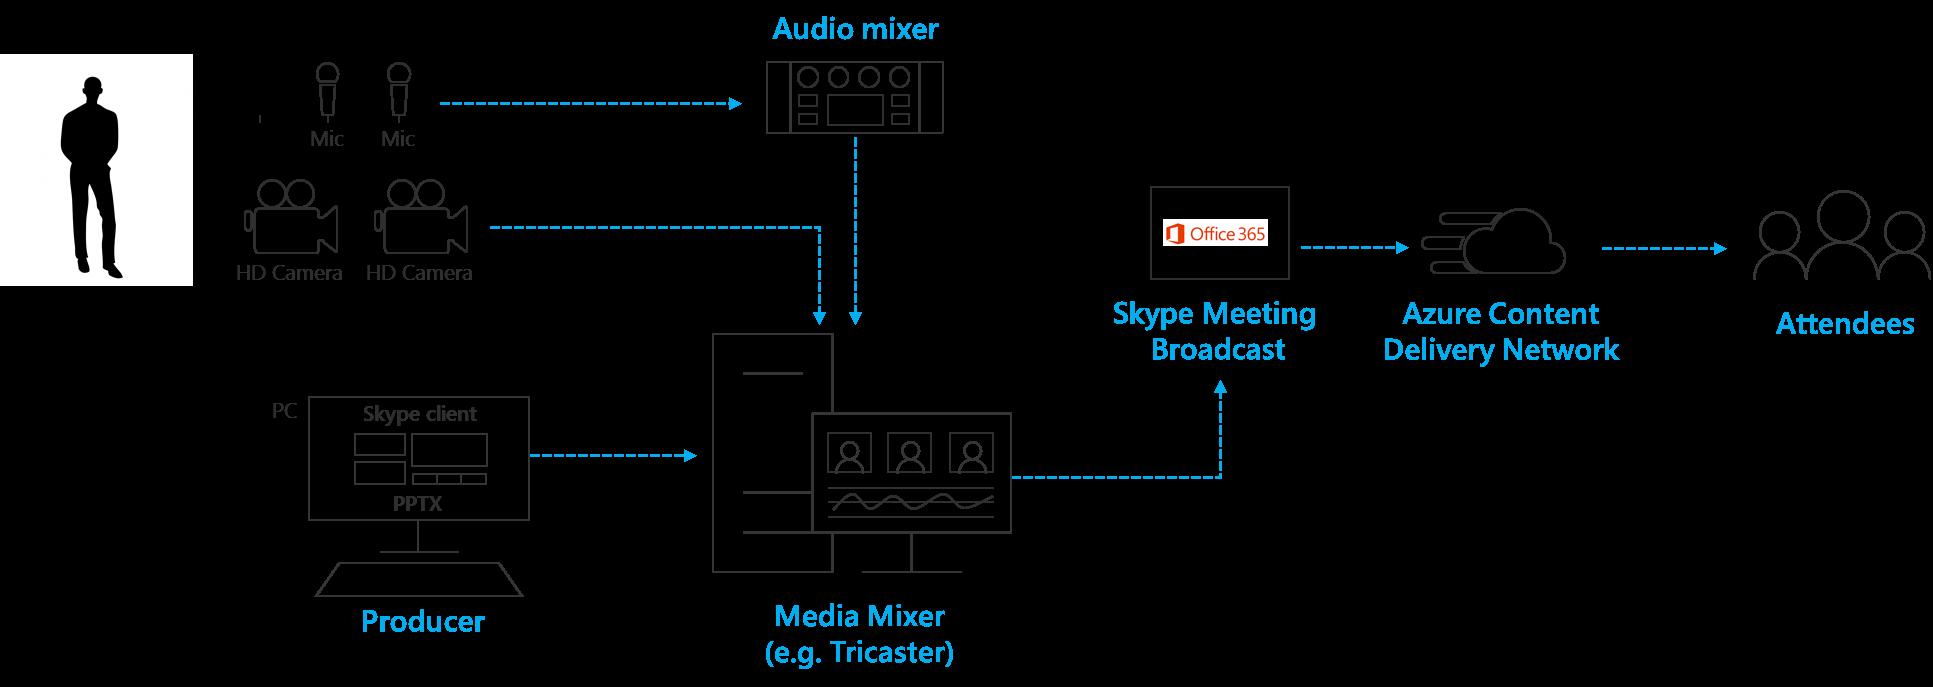 Bytte flere kilder i en maskinvare syn mikser